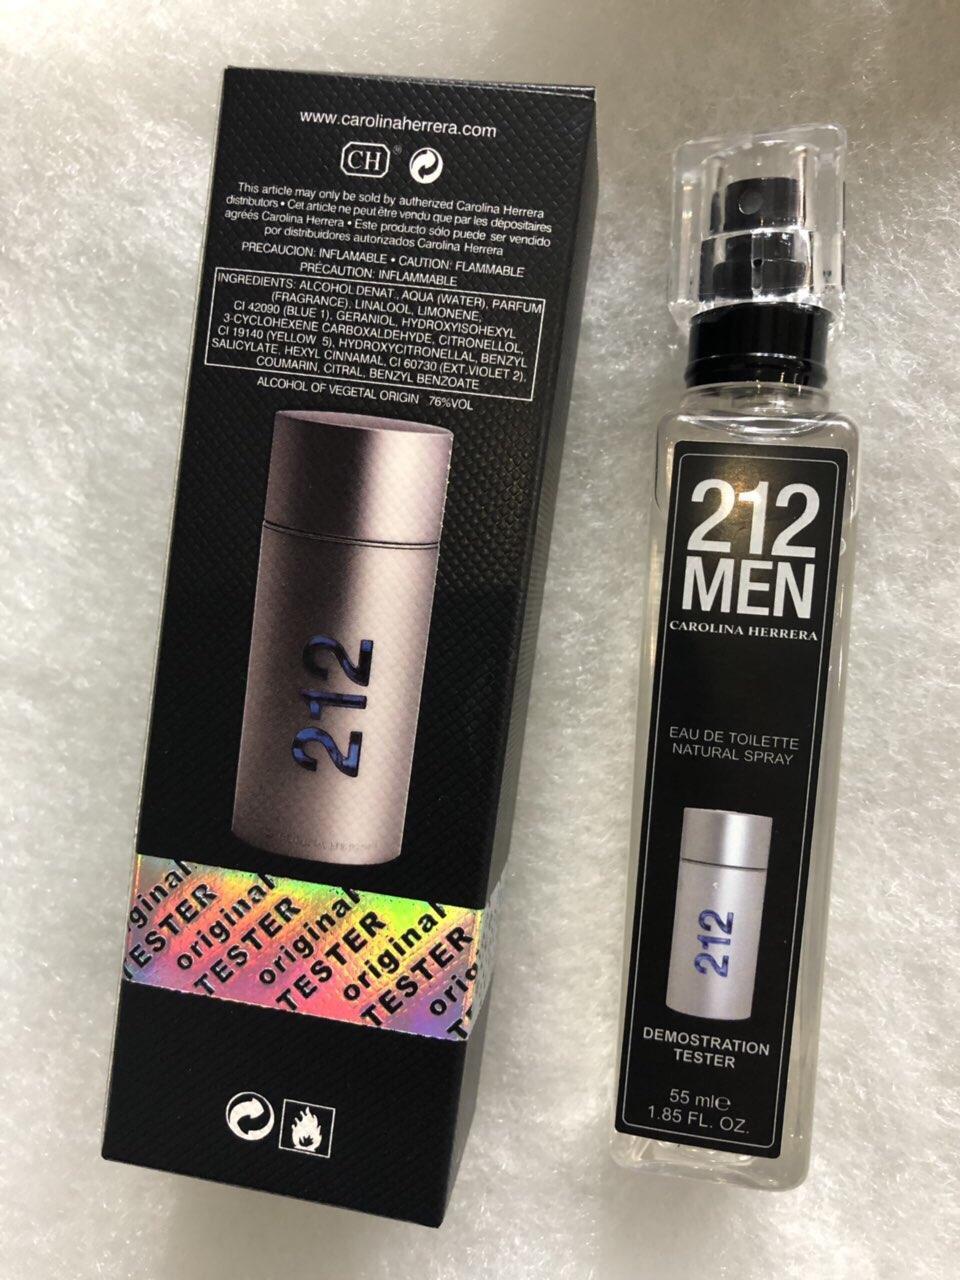 Carolina Herrera 212 Men мужская туалетная вода тестер 55 ml (реплика)